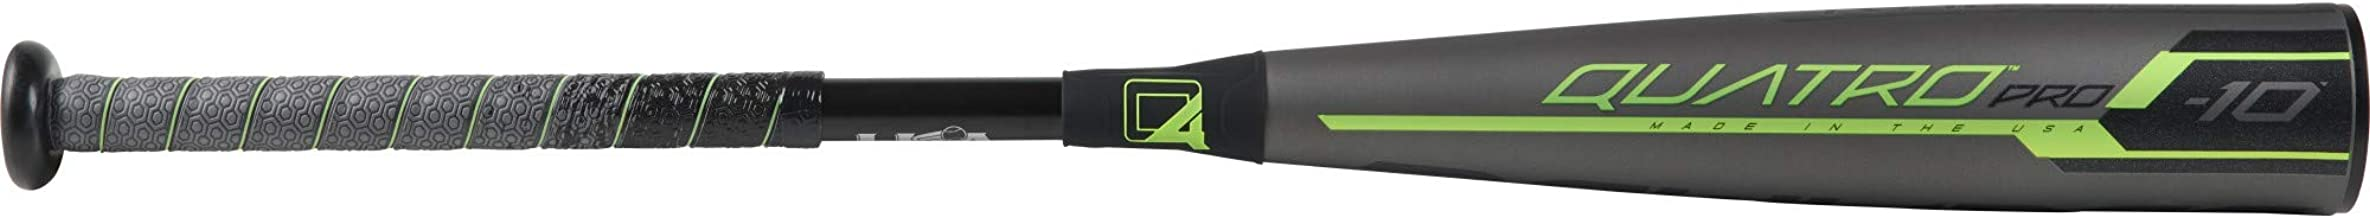 Rawlings 2019 Quatro Pro USA Youth Baseball Bat